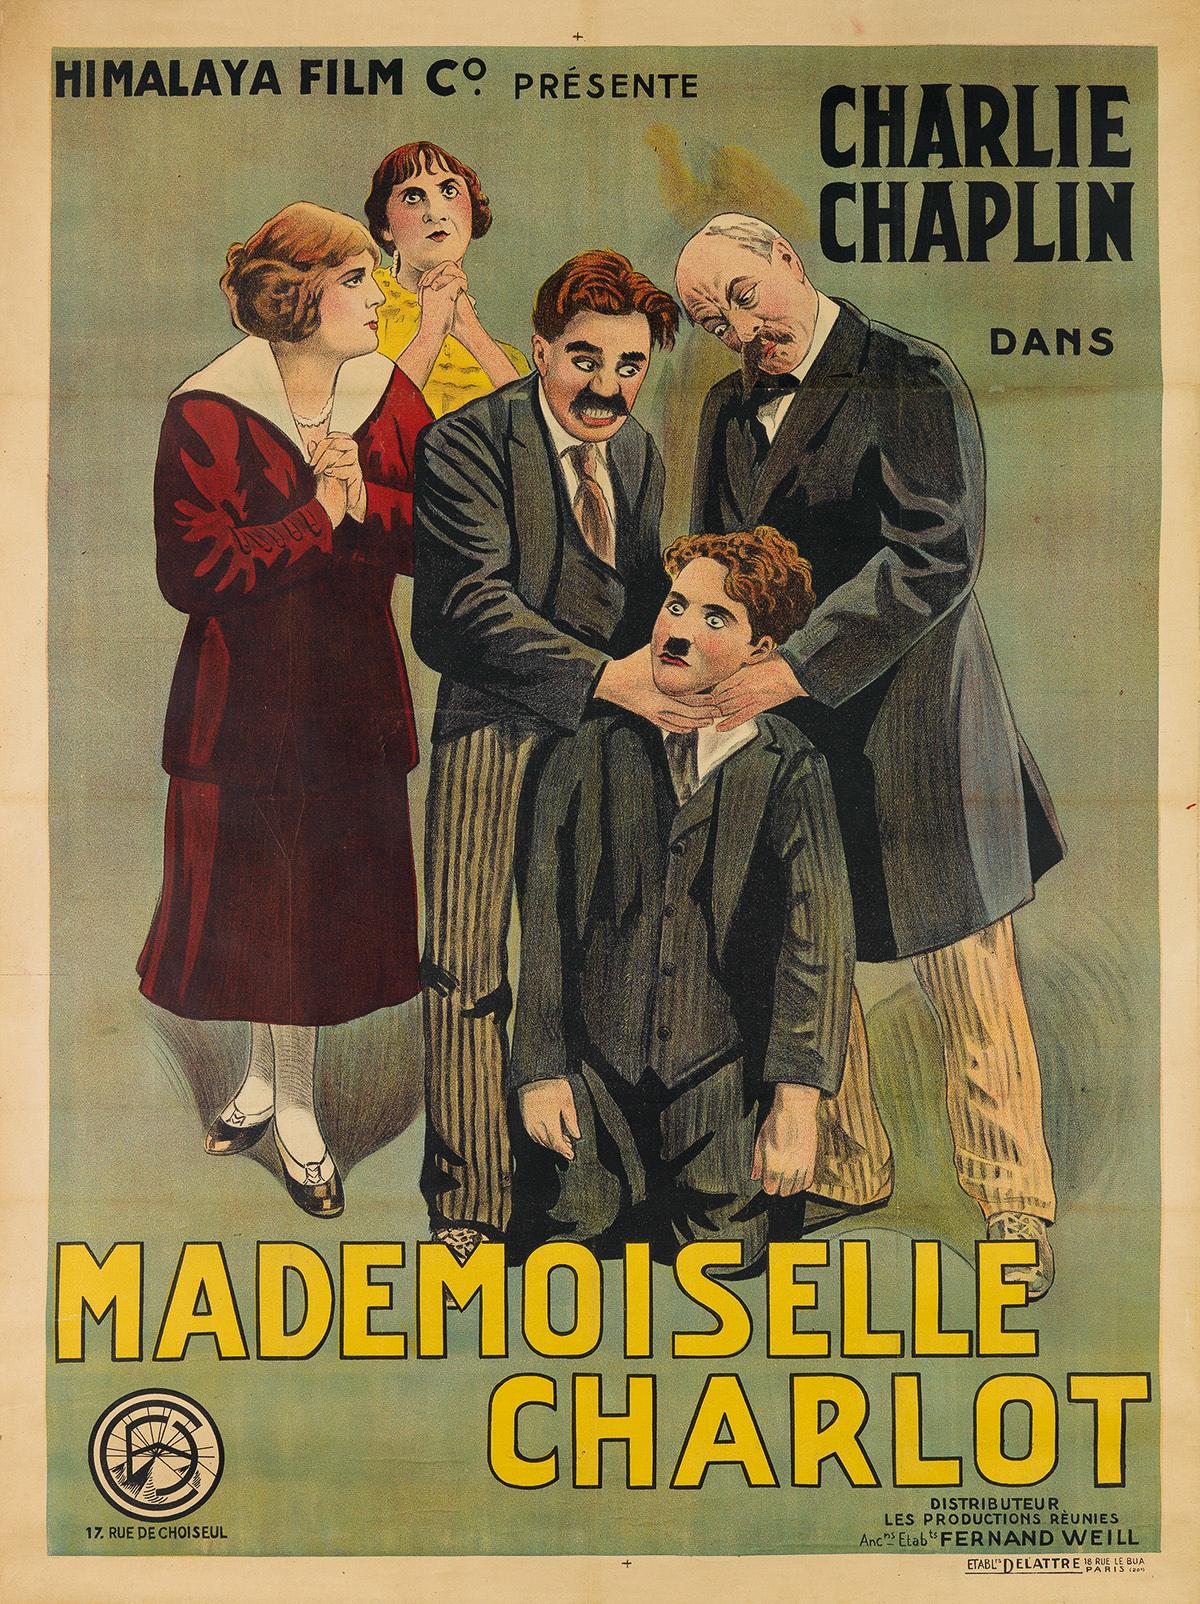 DESIGNER UNKNOWN. CHARLIE CHAPLIN DANS MADEMOISELLE CHARLOT. 1915. 63x47 inches, 160x119 cm. Dellatre, Paris.